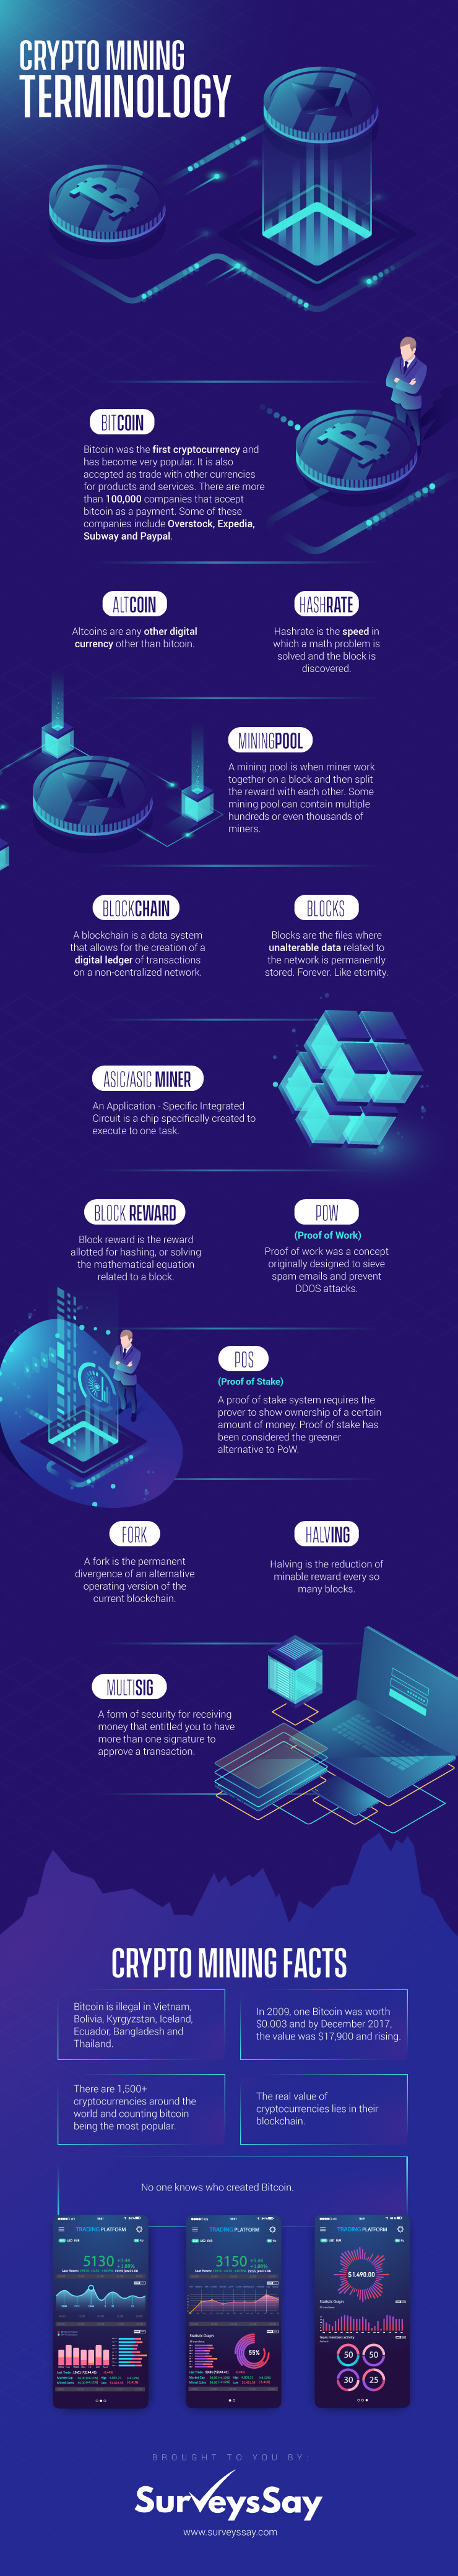 Cryptomining-Terminology